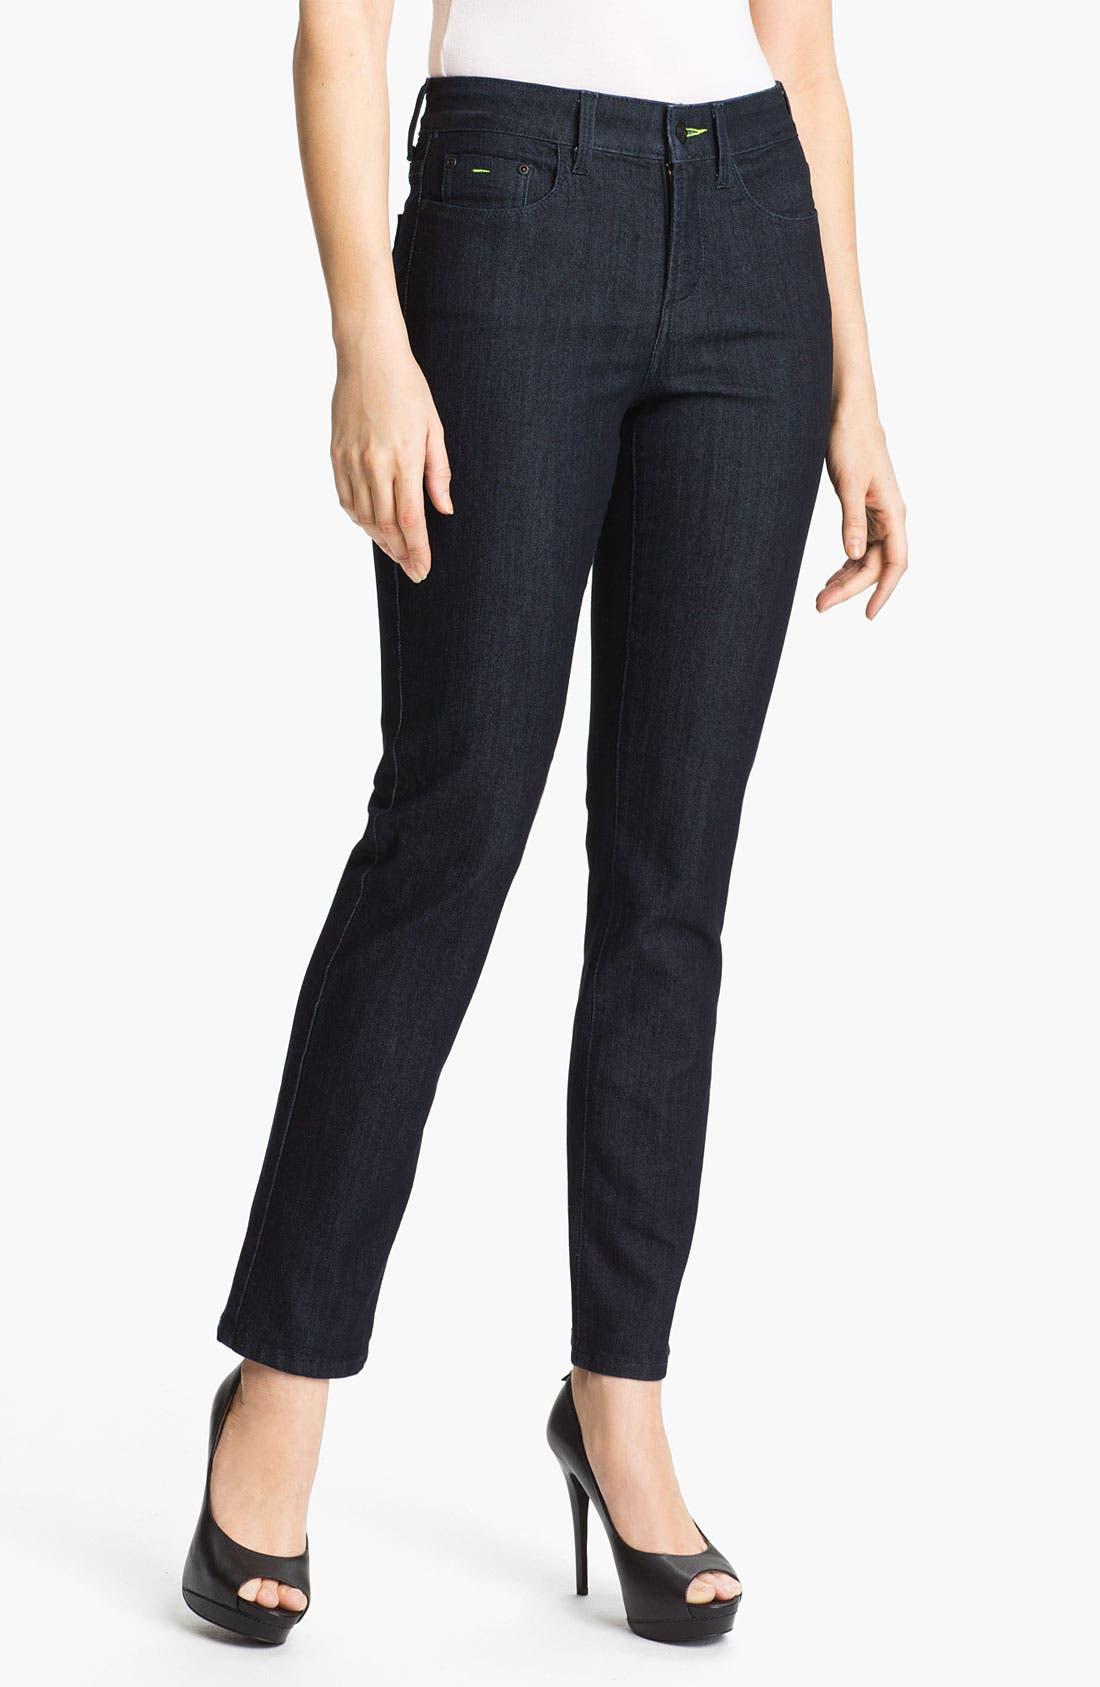 Main Image - NYDJ 'Sheri' Neon Stitch Skinny Stretch Jeans